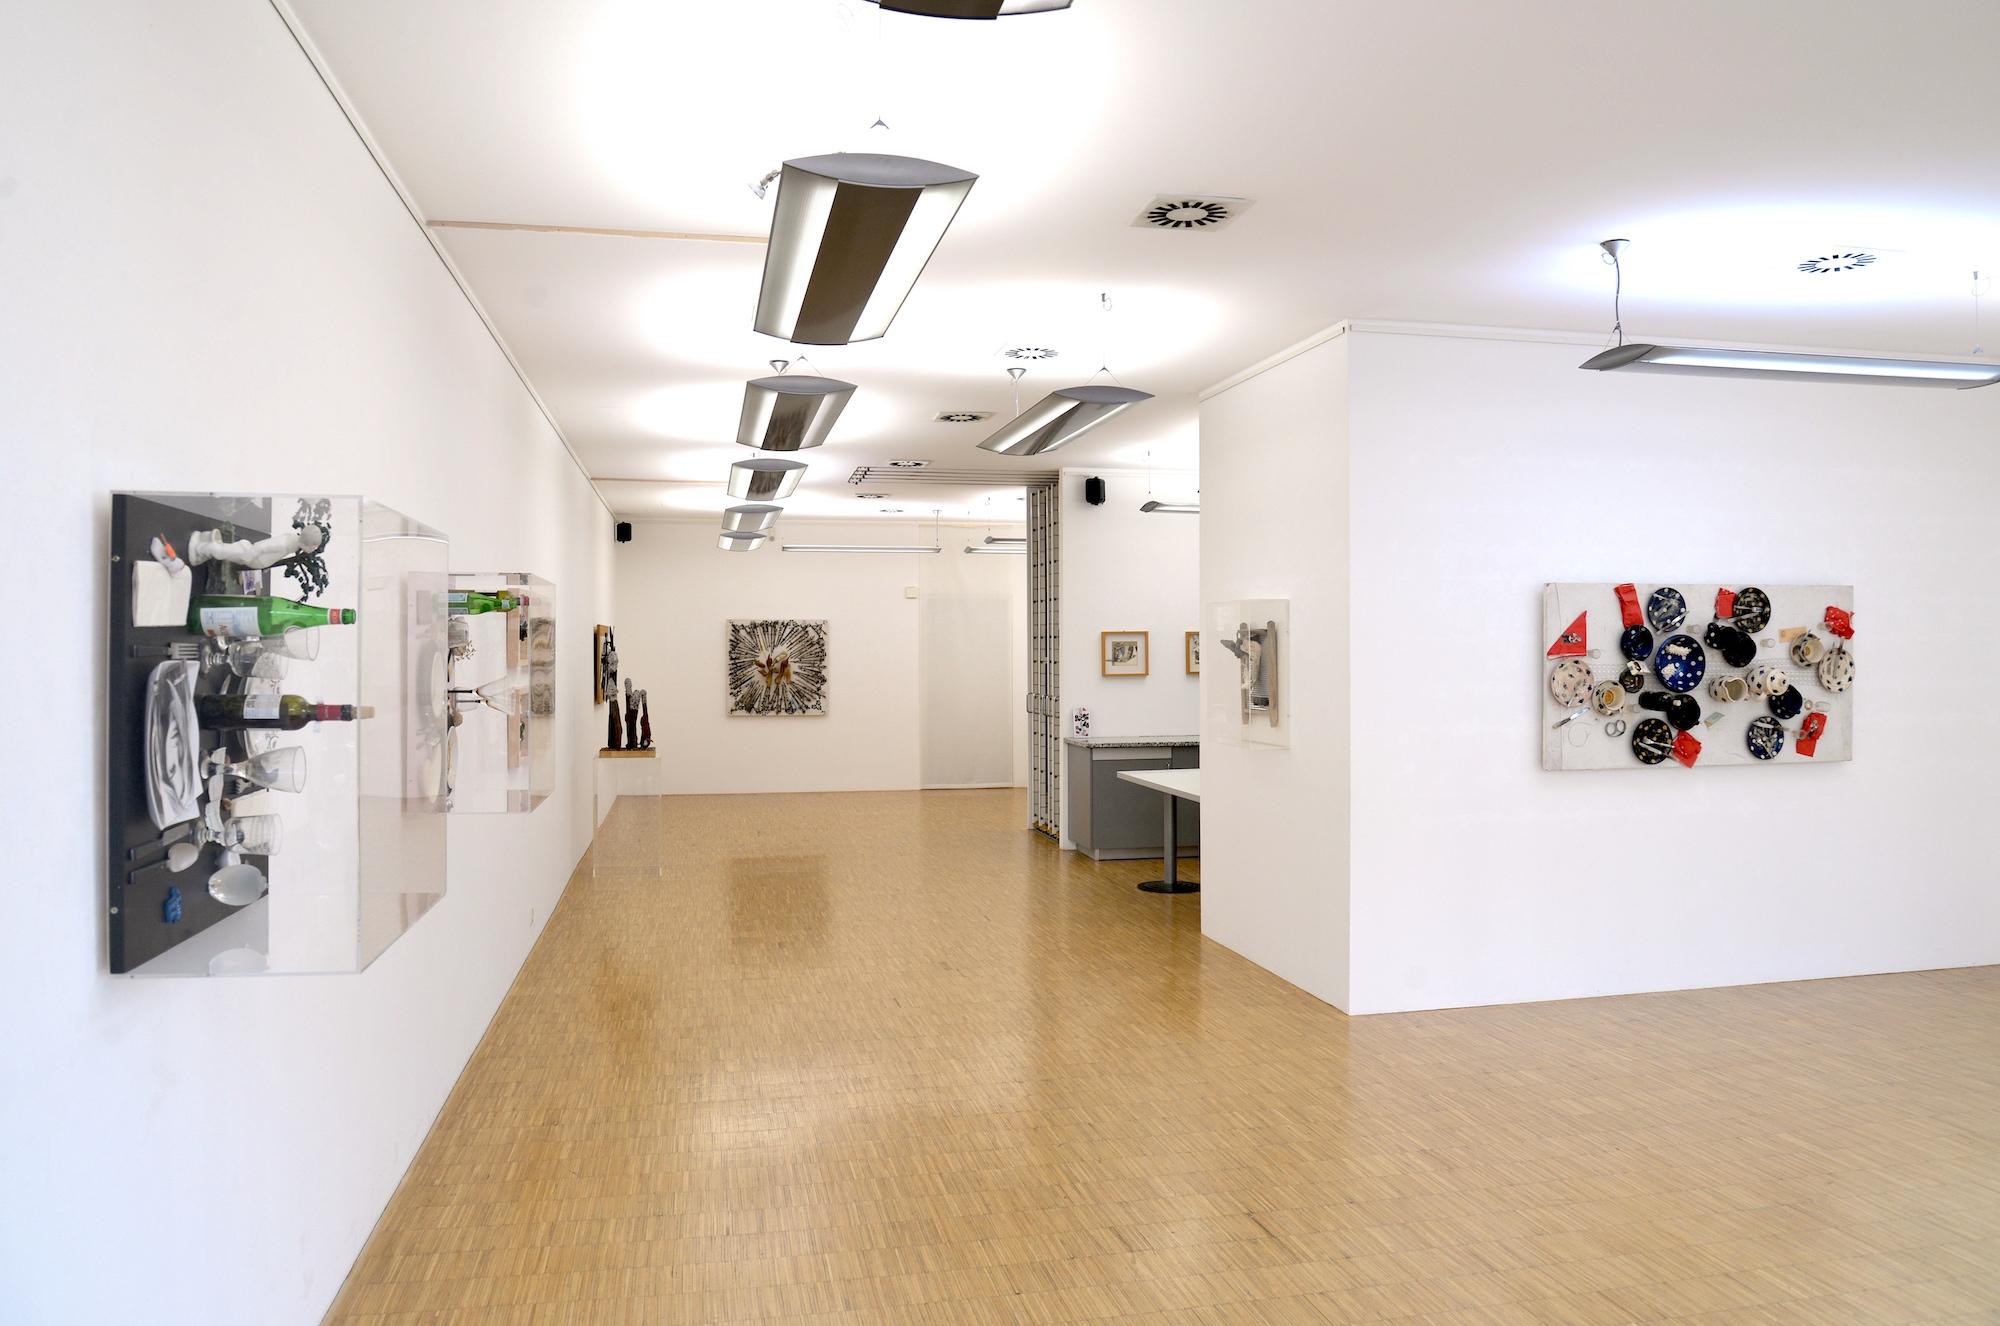 Kunst in der Galerie Geiger